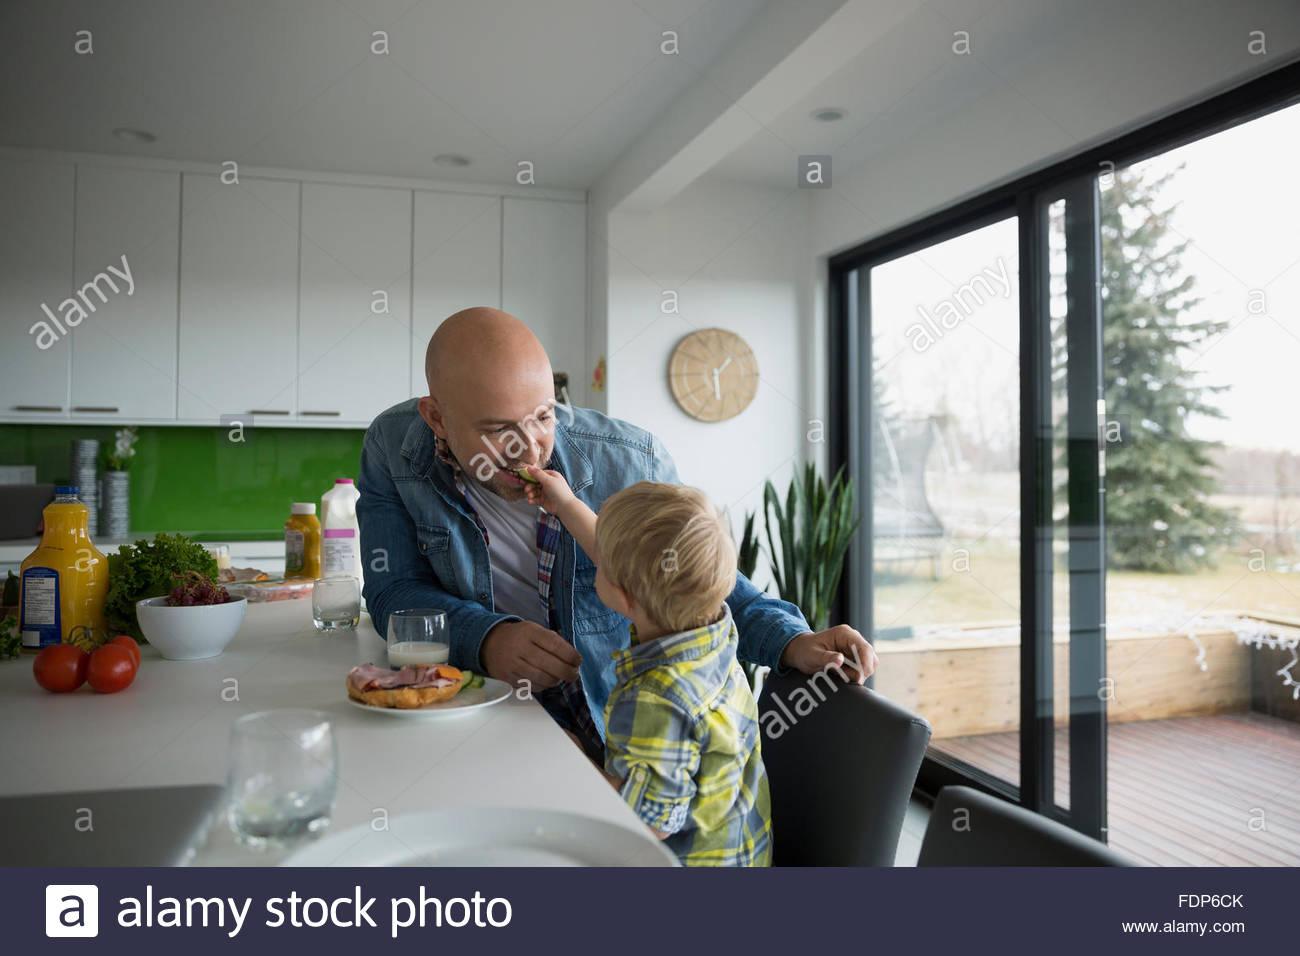 Boy feeding father at kitchen island - Stock Image